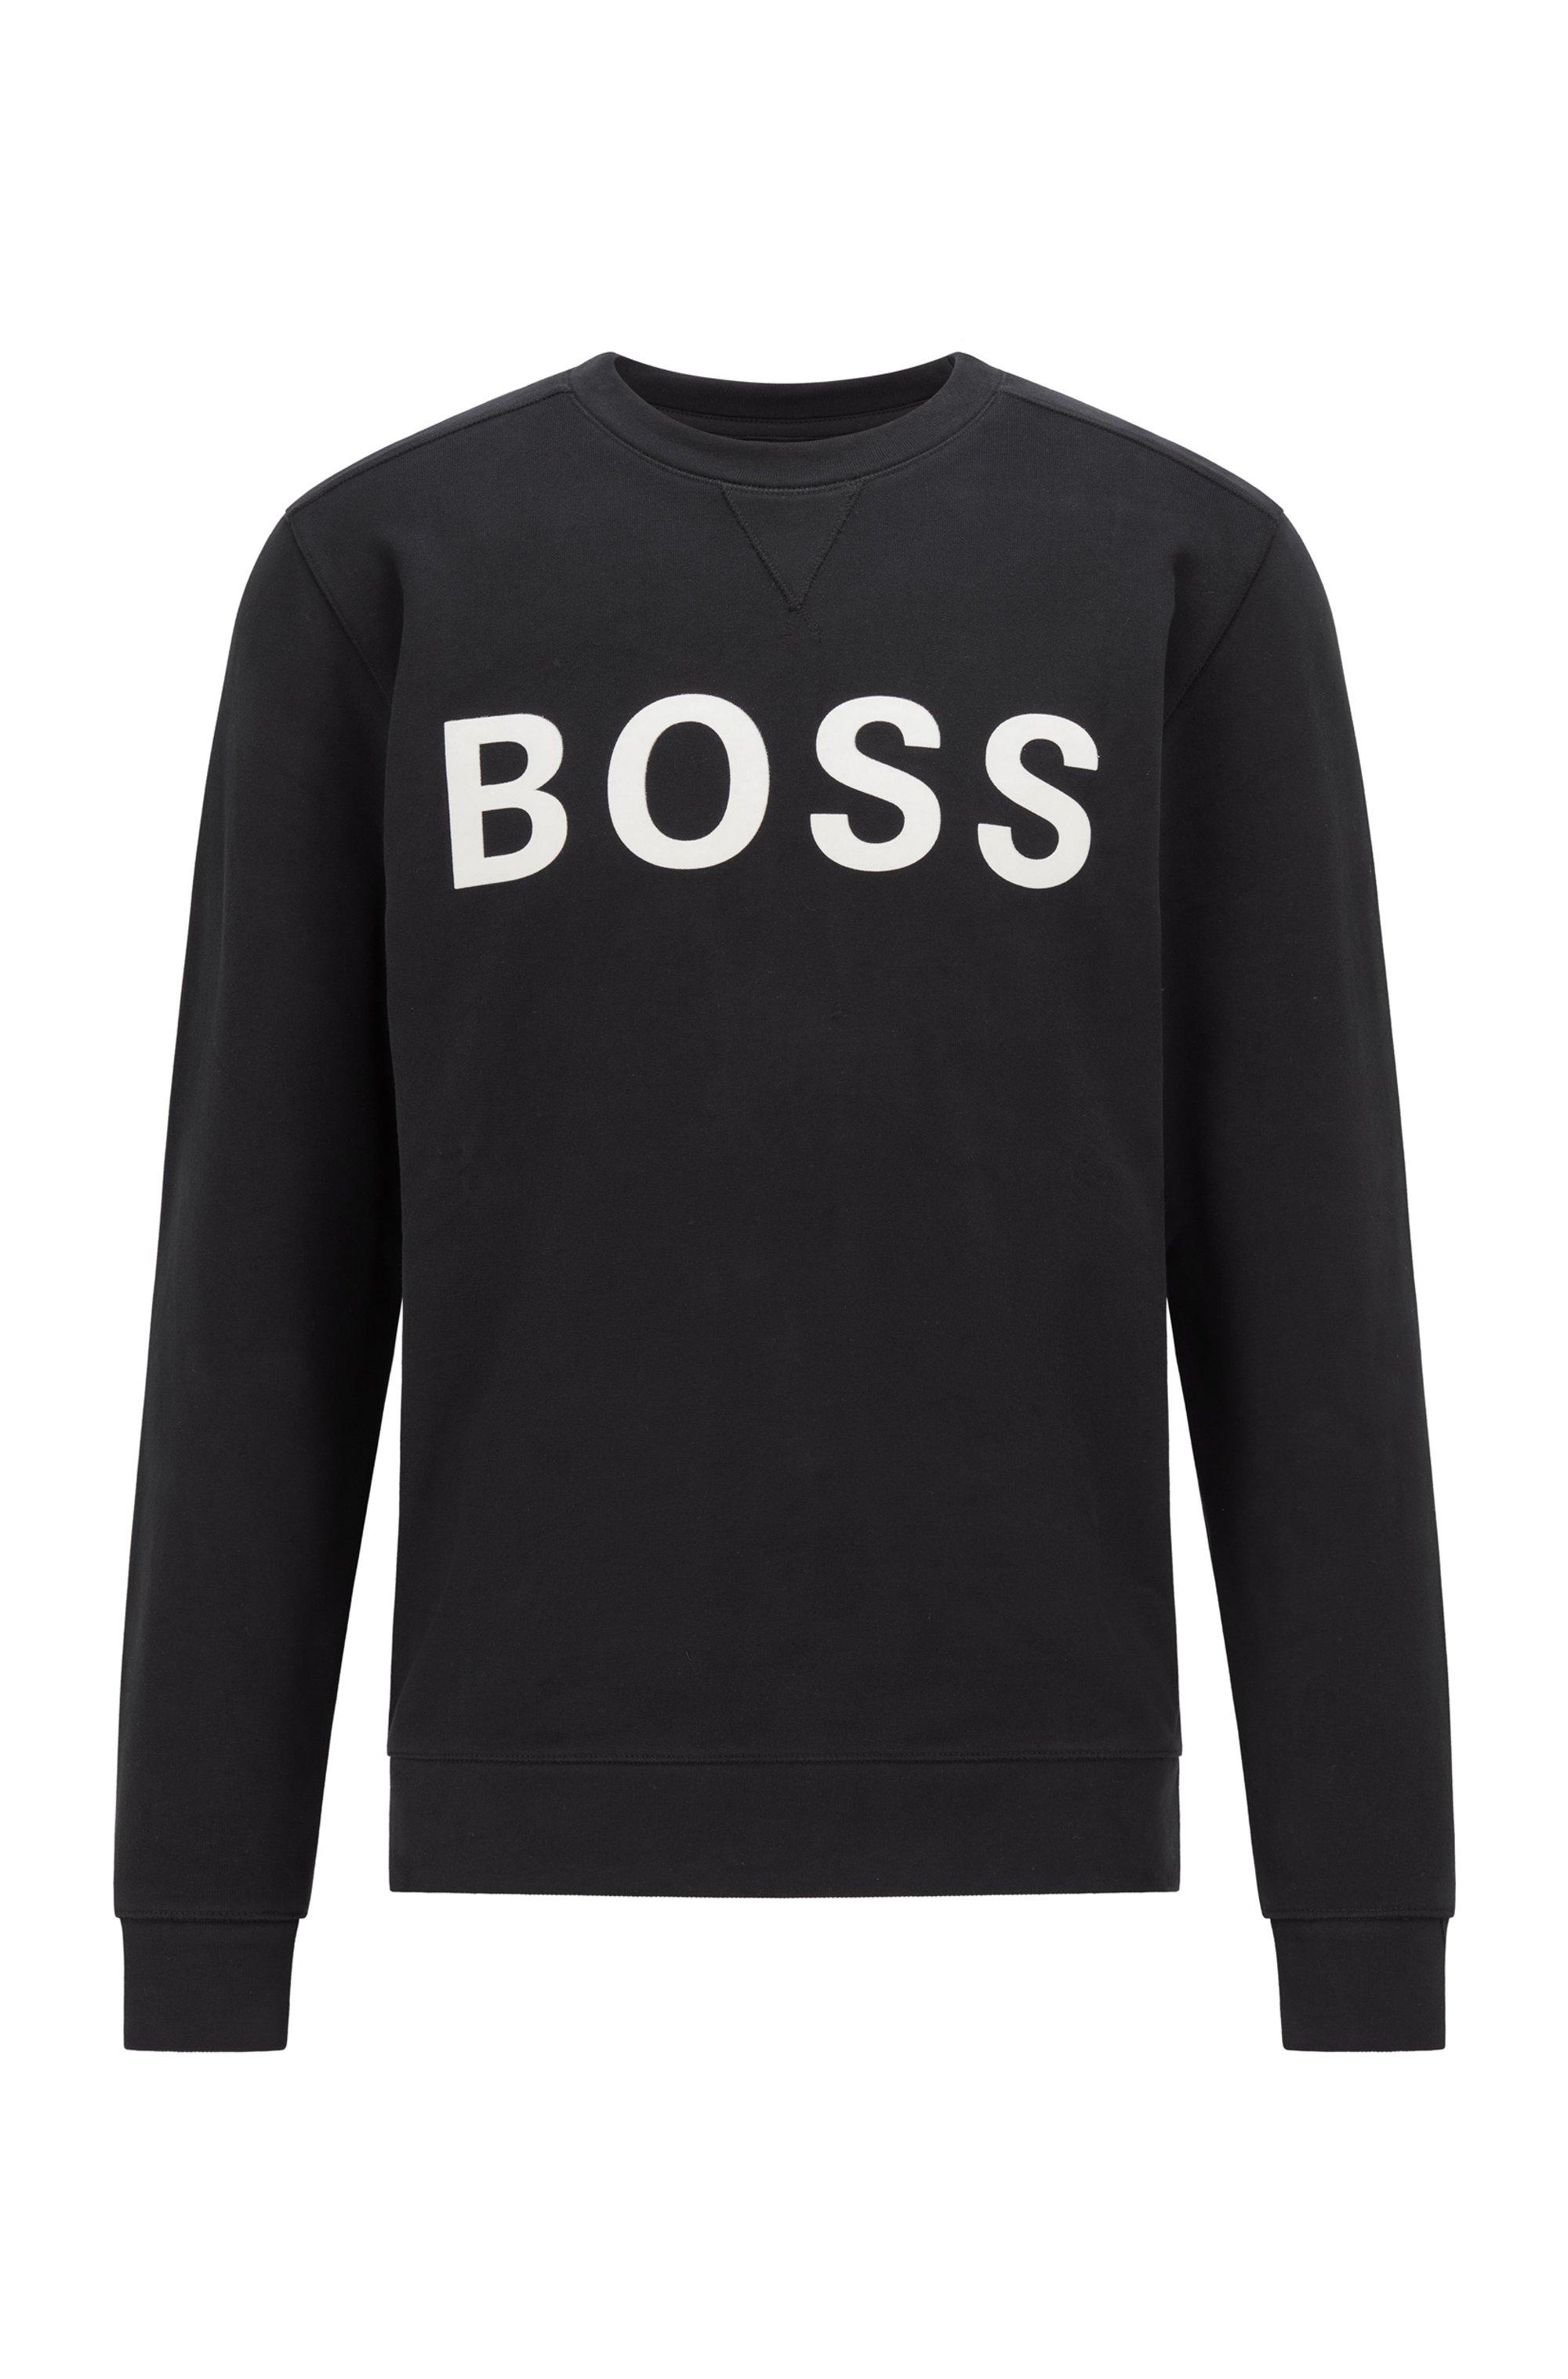 Cotton-blend sweatshirt with flock-print logo, Black